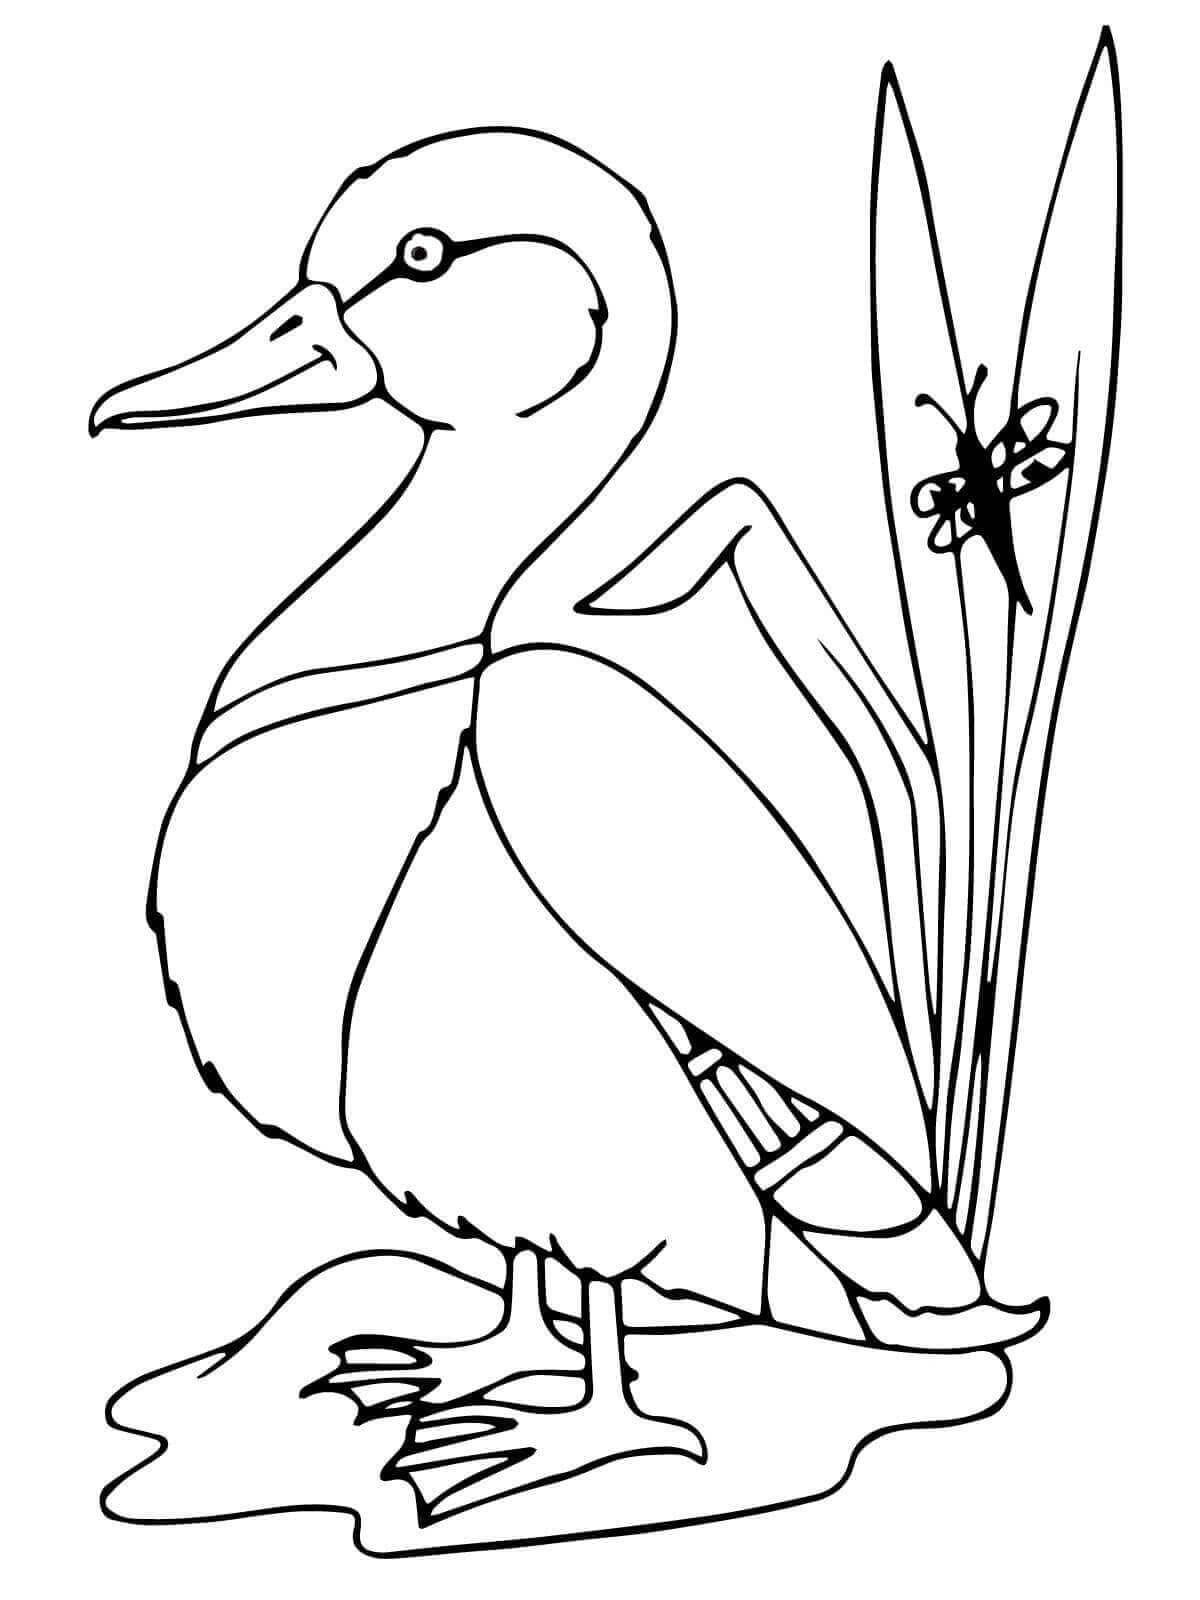 Mallard Duck coloring sheet